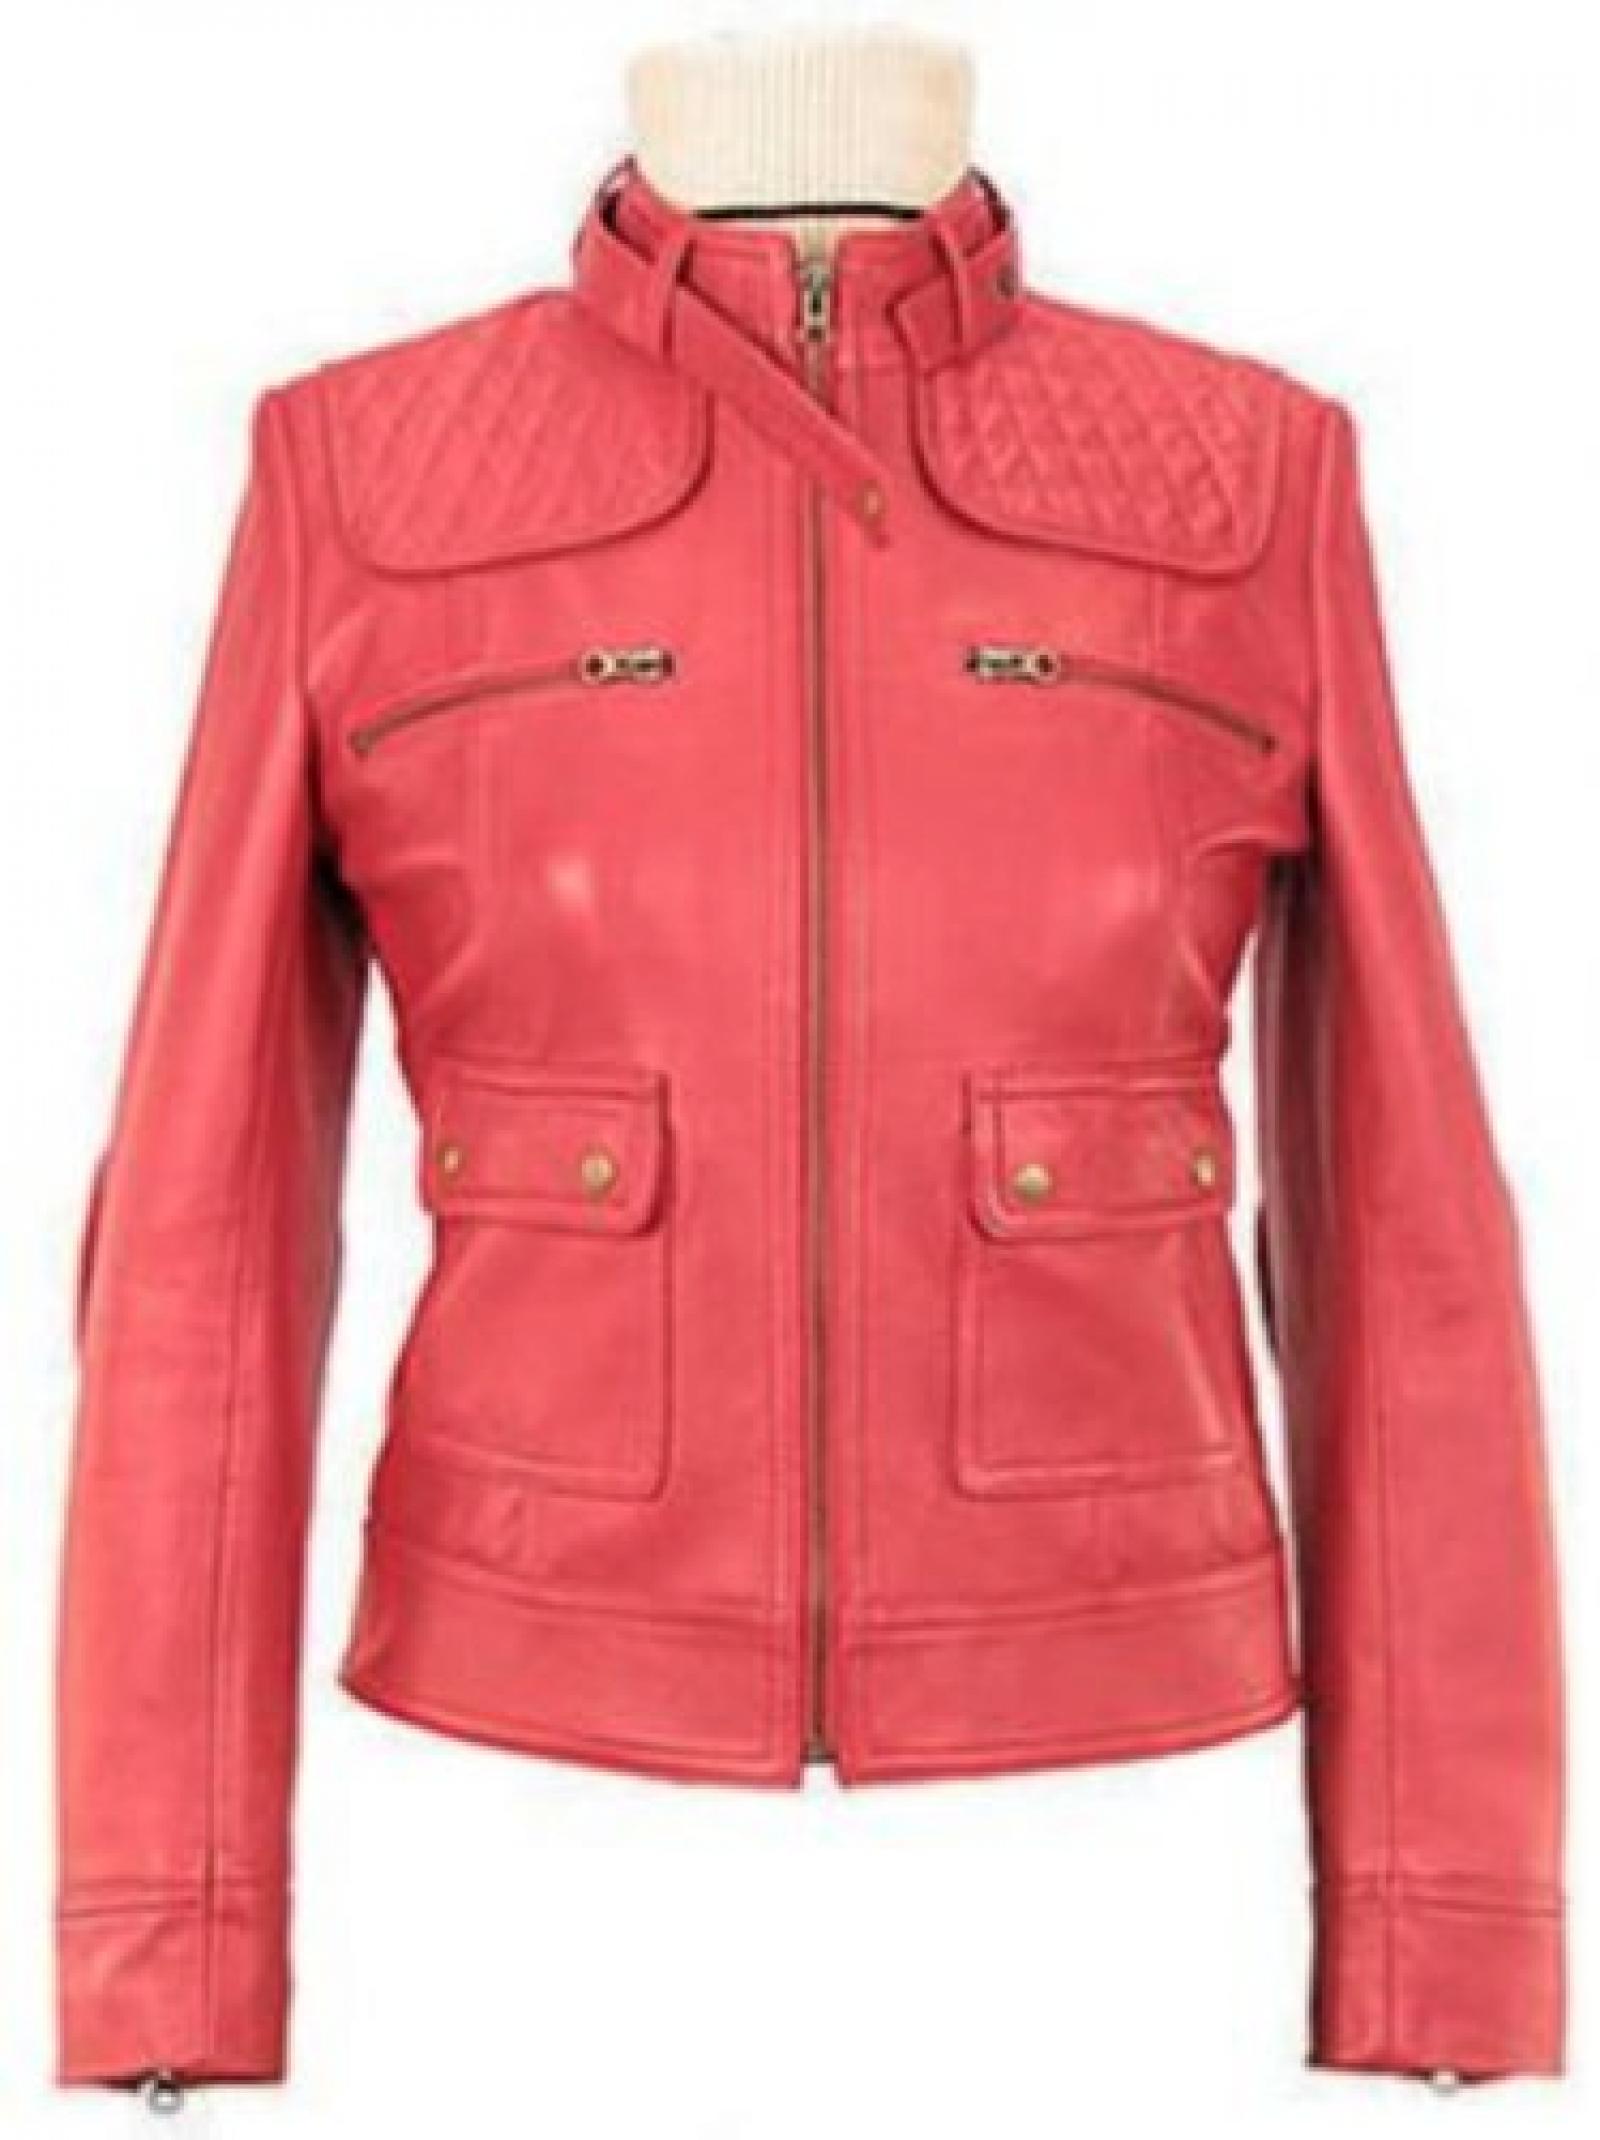 Alpakaandmore Pink Lamm nappa Lederjacke handgefertigt, Motorradjacke QW151